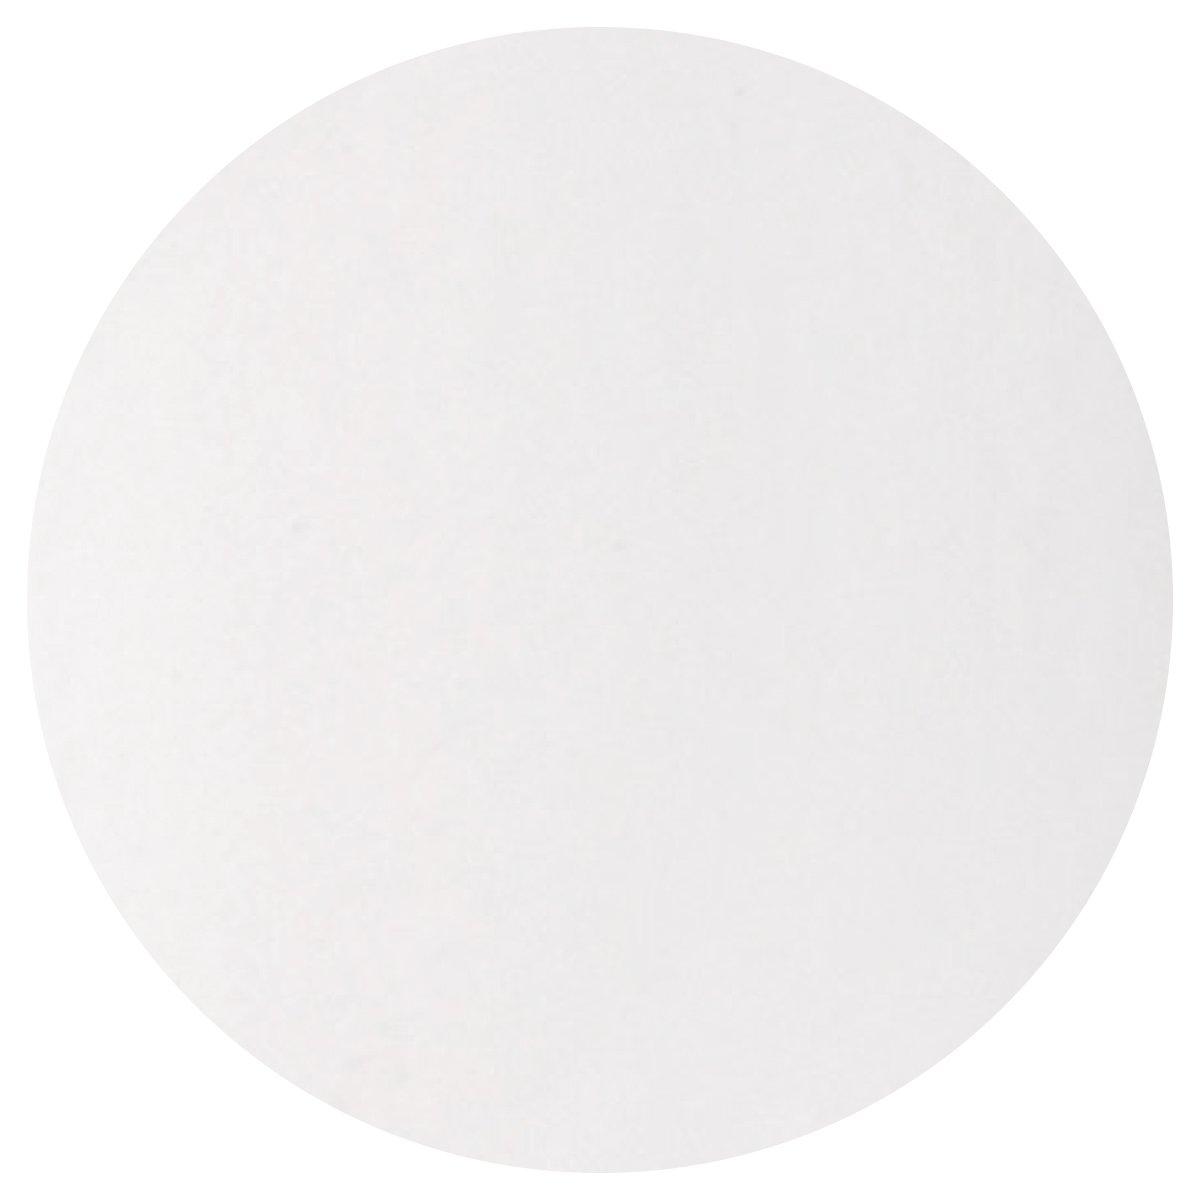 Lithonia Lighting WF4 SQ B LED 27K MW M6 Ultra-Thin Square LED Recessed Ceiling Light, 2700K | Warm White, Matte White by Lithonia Lighting (Image #2)